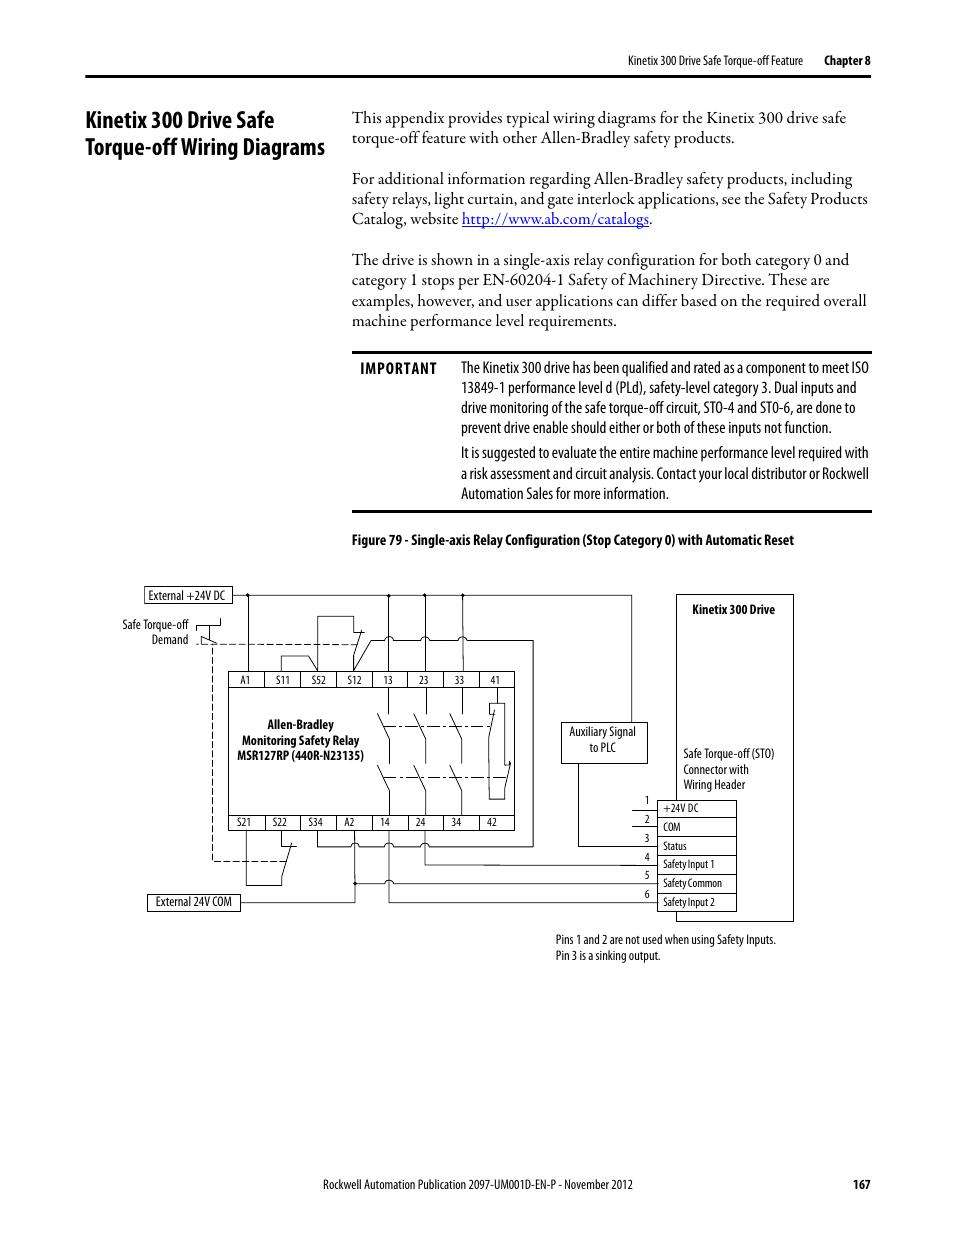 Glamorous 8 Pin Relay Wiring Diagram Pictures - ufc204.us ...